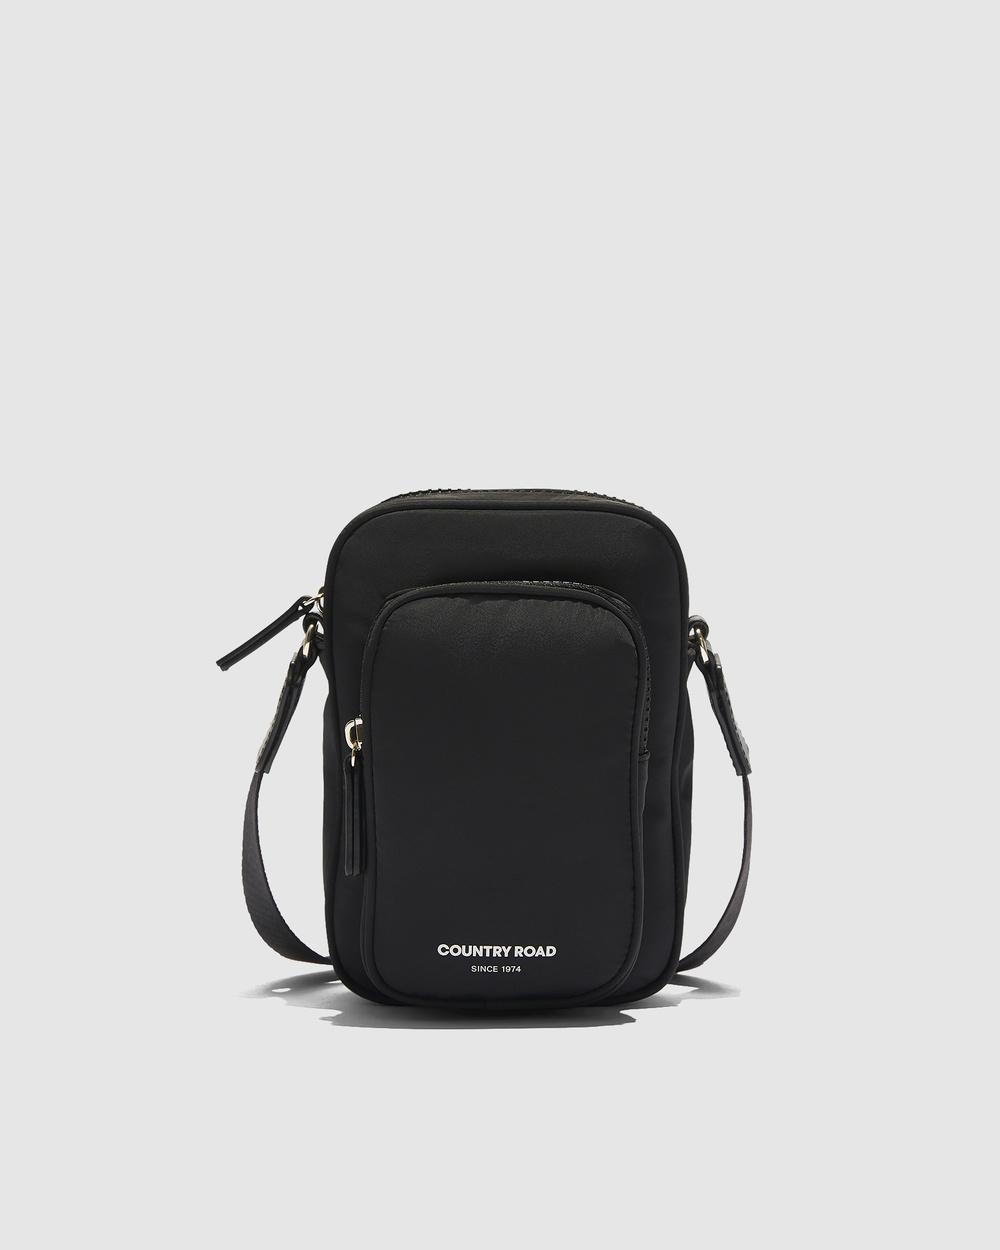 Country Road Soft Mini Bag Bags black